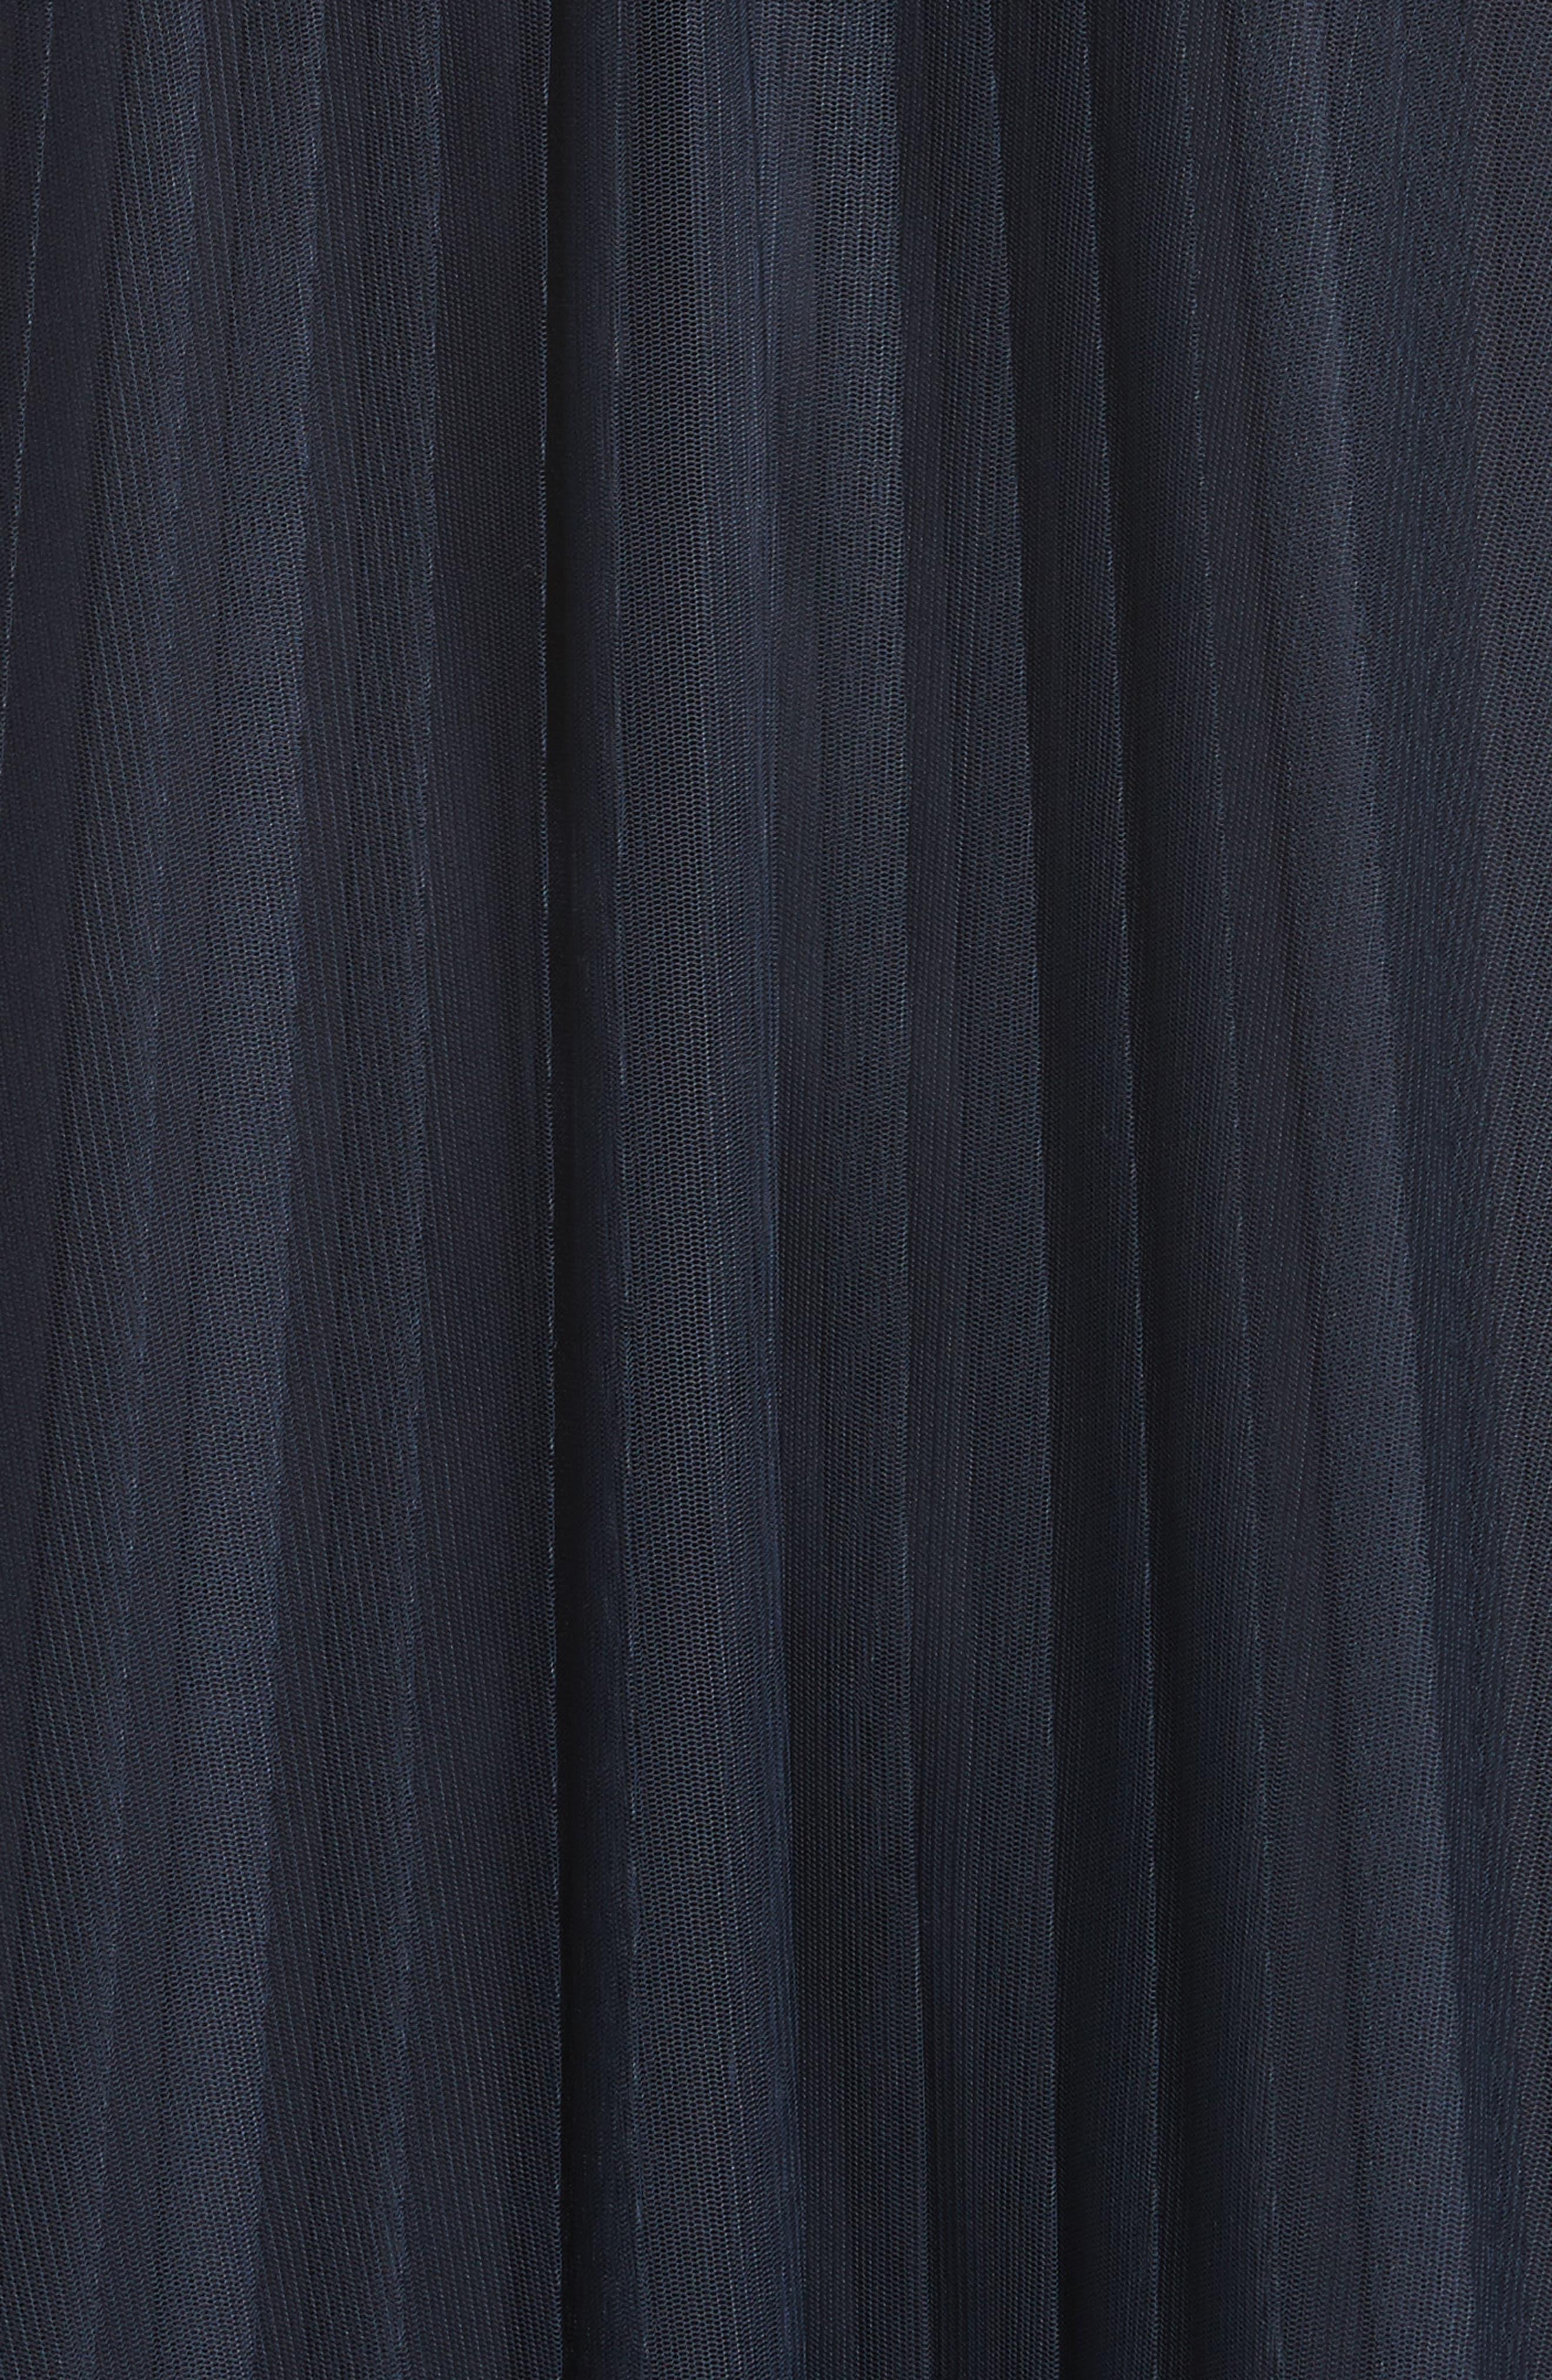 Pleated Mesh Dress,                             Alternate thumbnail 5, color,                             434